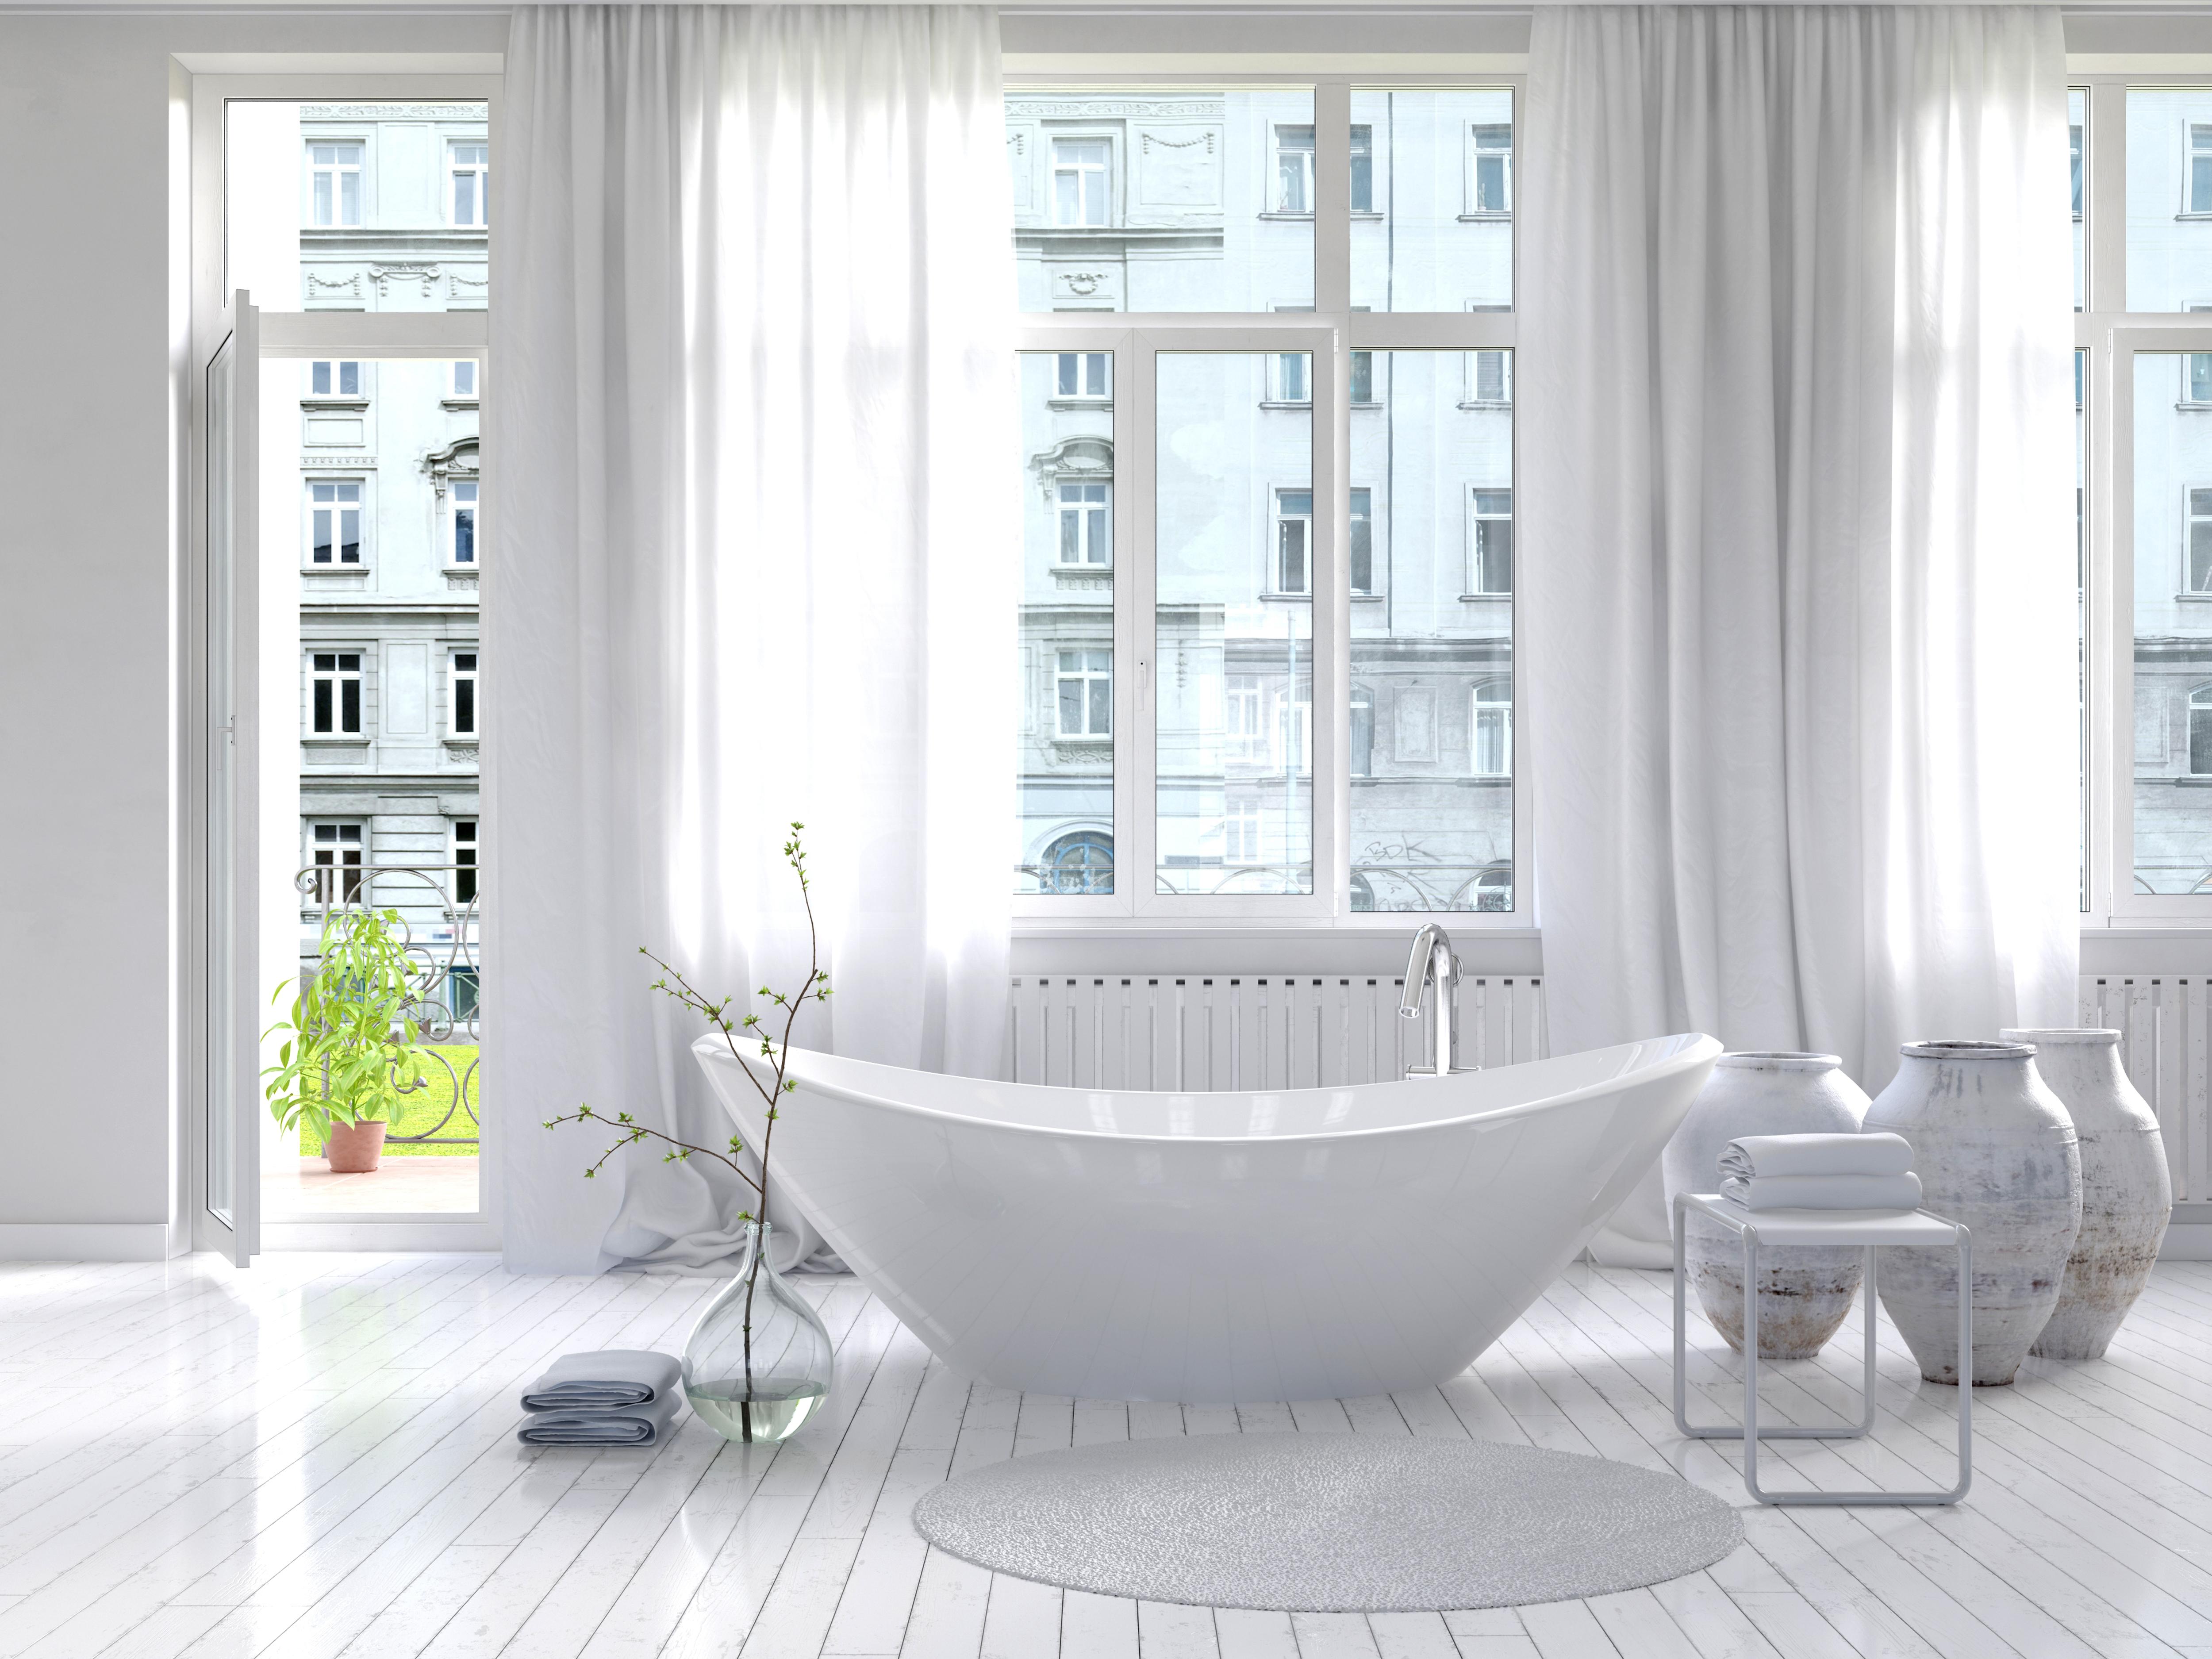 Pure white bathroom interior with separa